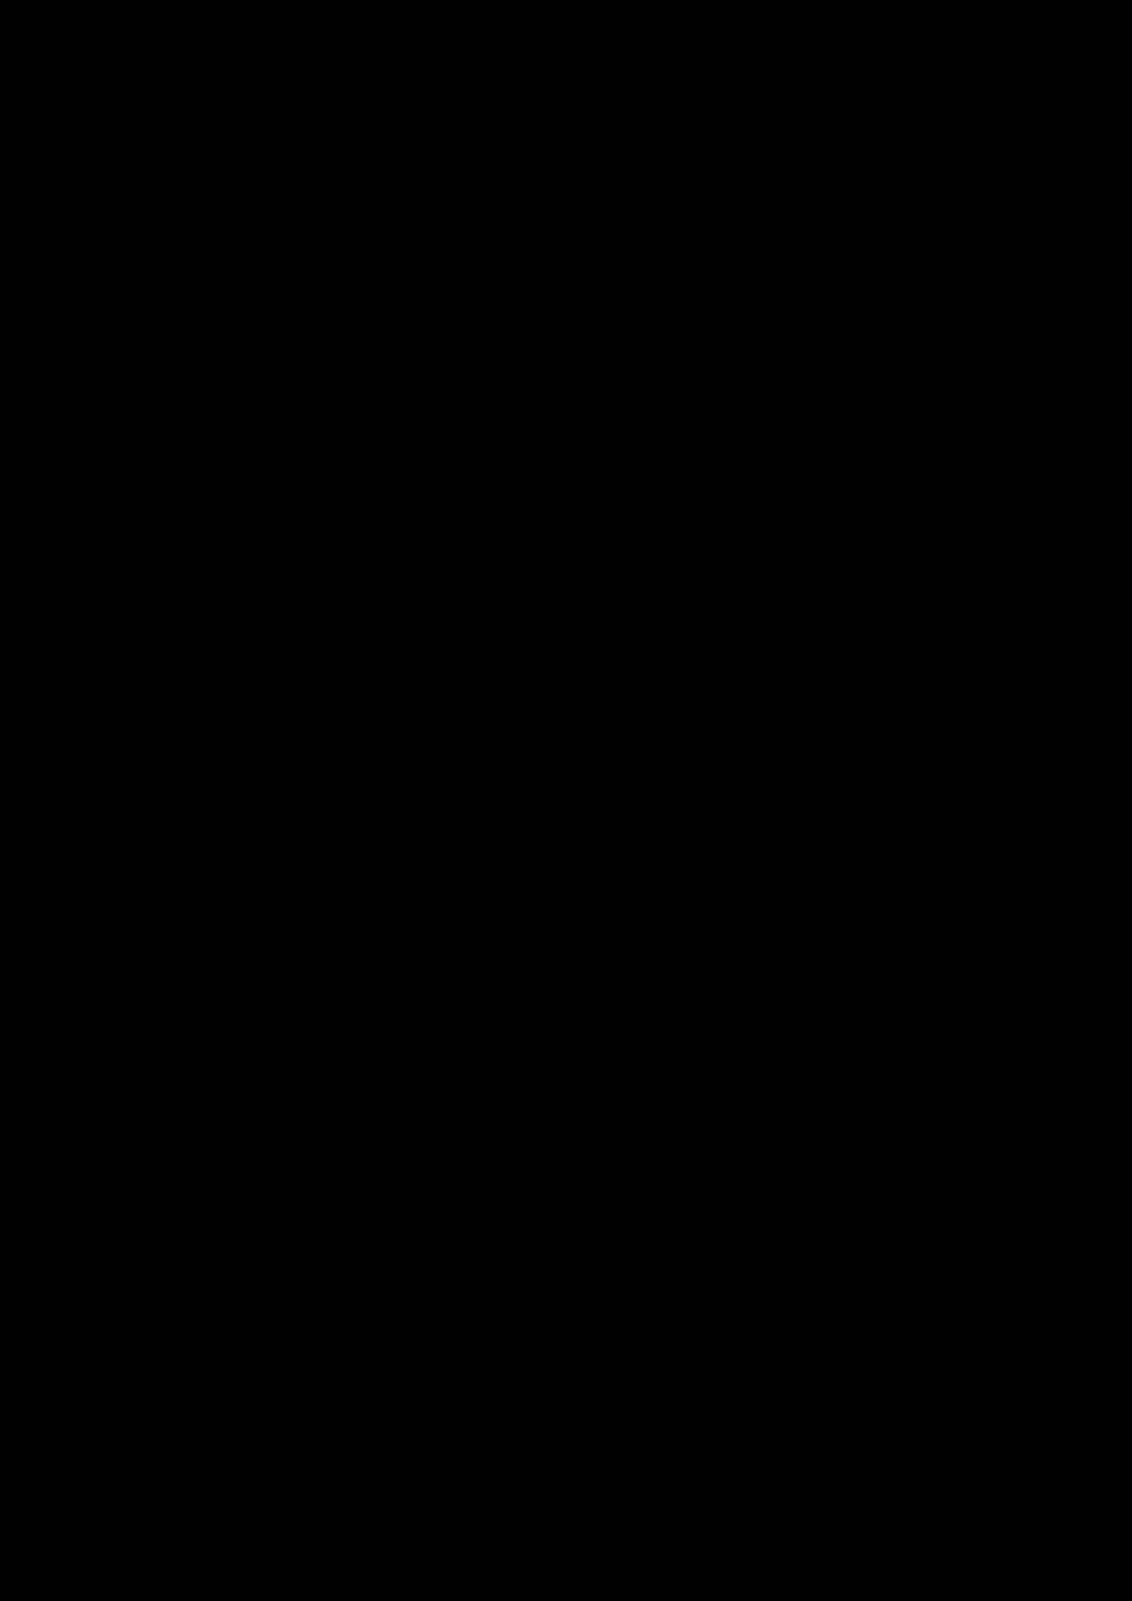 Romans o sleze slide, Image 32